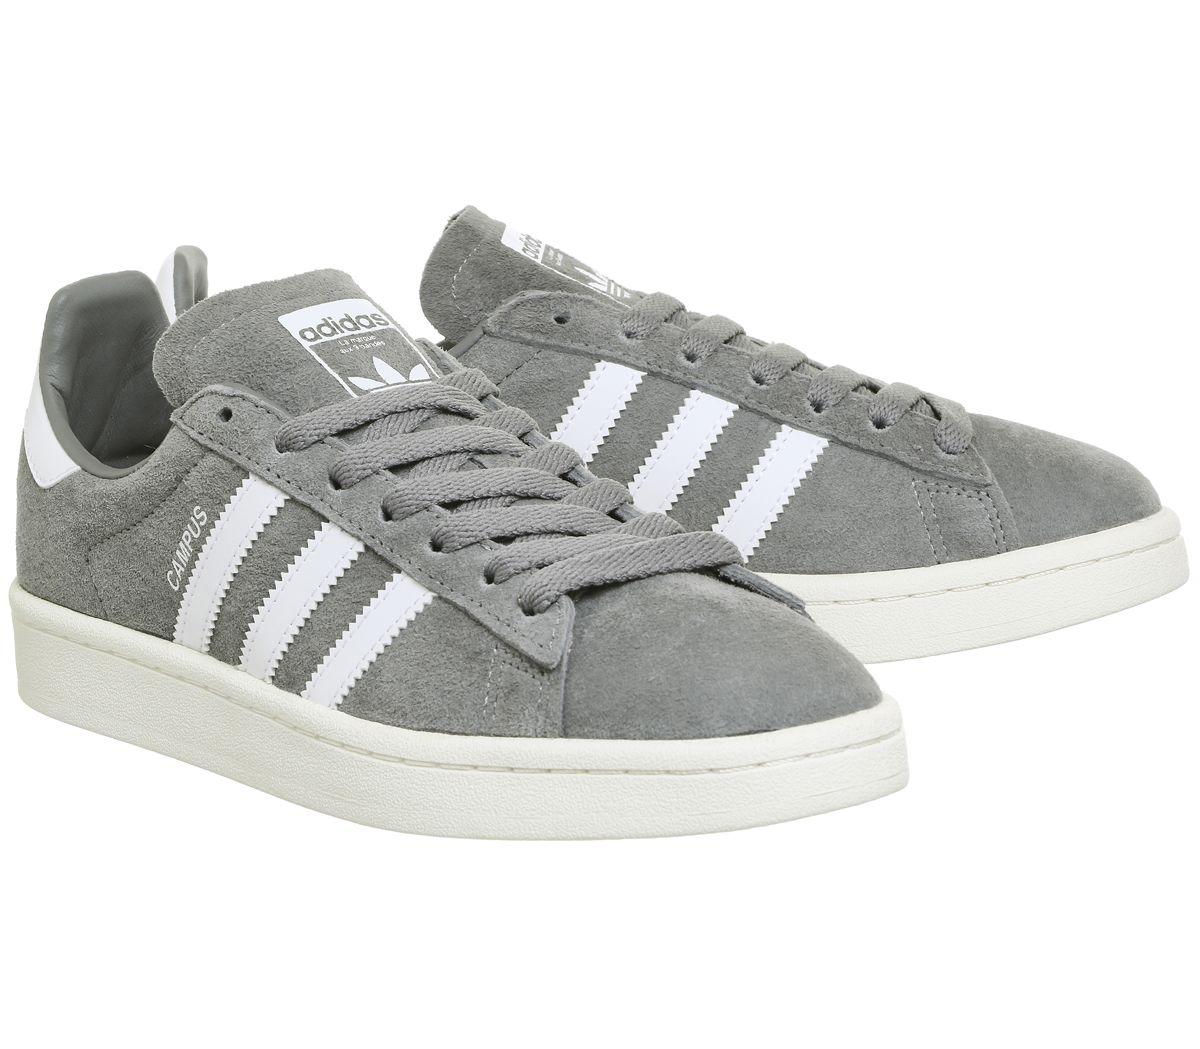 super popular 4bda6 ff3f4 Sentinel Mens Adidas Campus Grey Three White Trainers Shoes